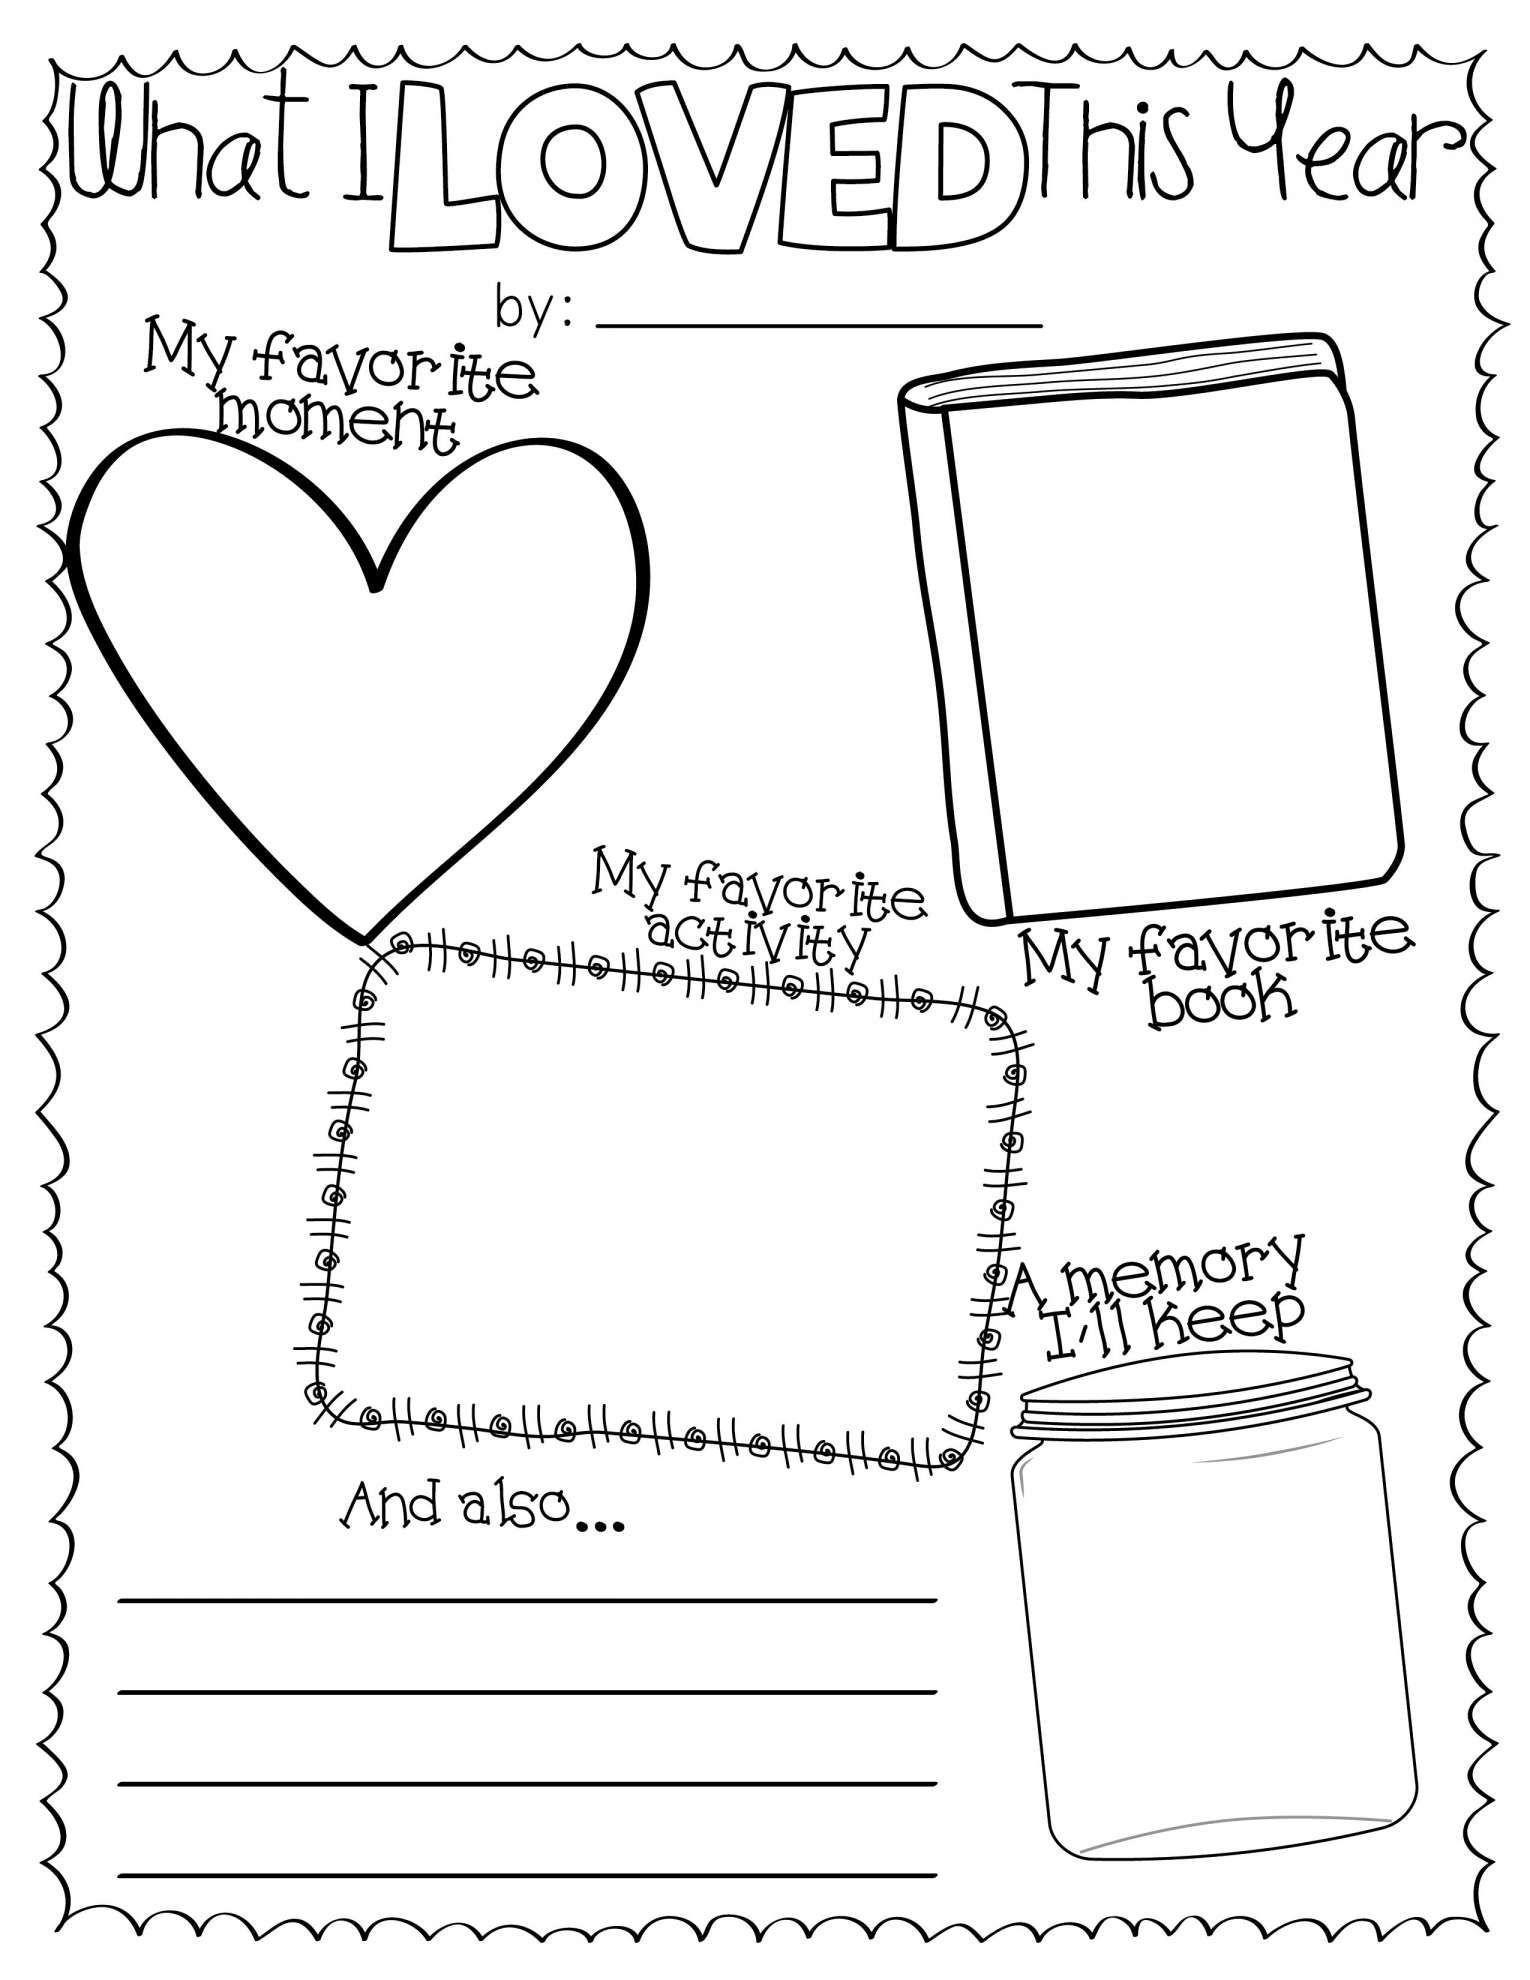 10 End Of Preschool Worksheet In With Images